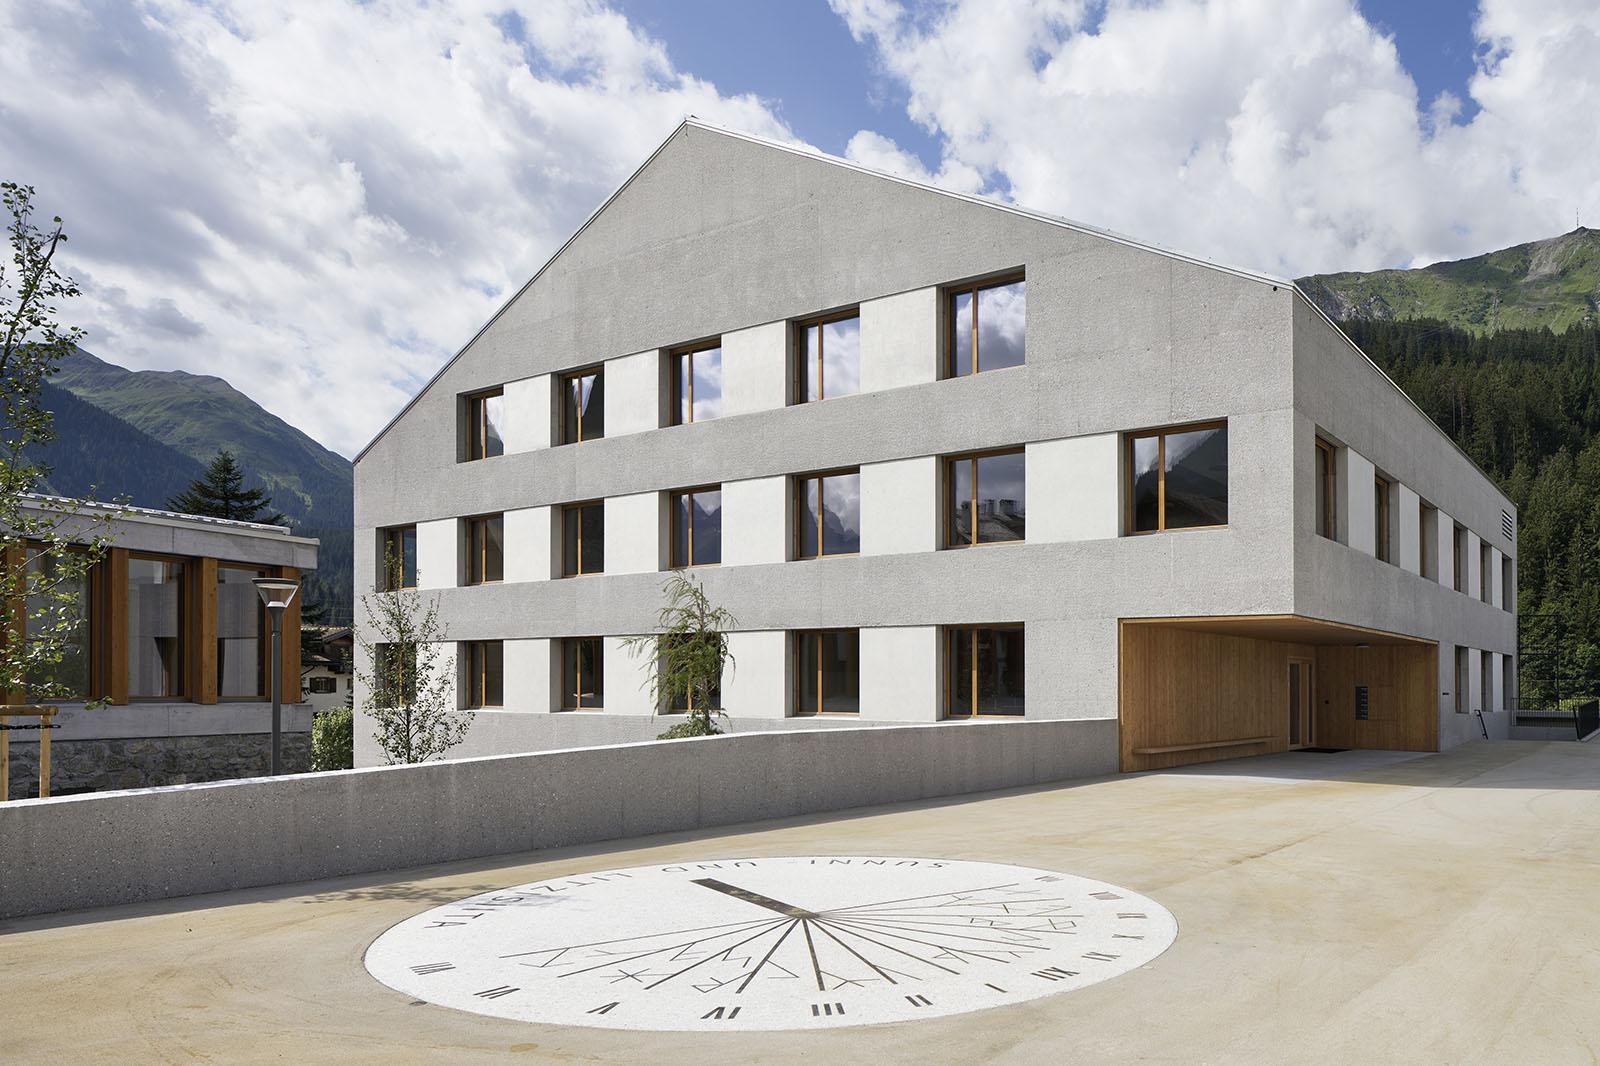 schulhaus-klosters-006